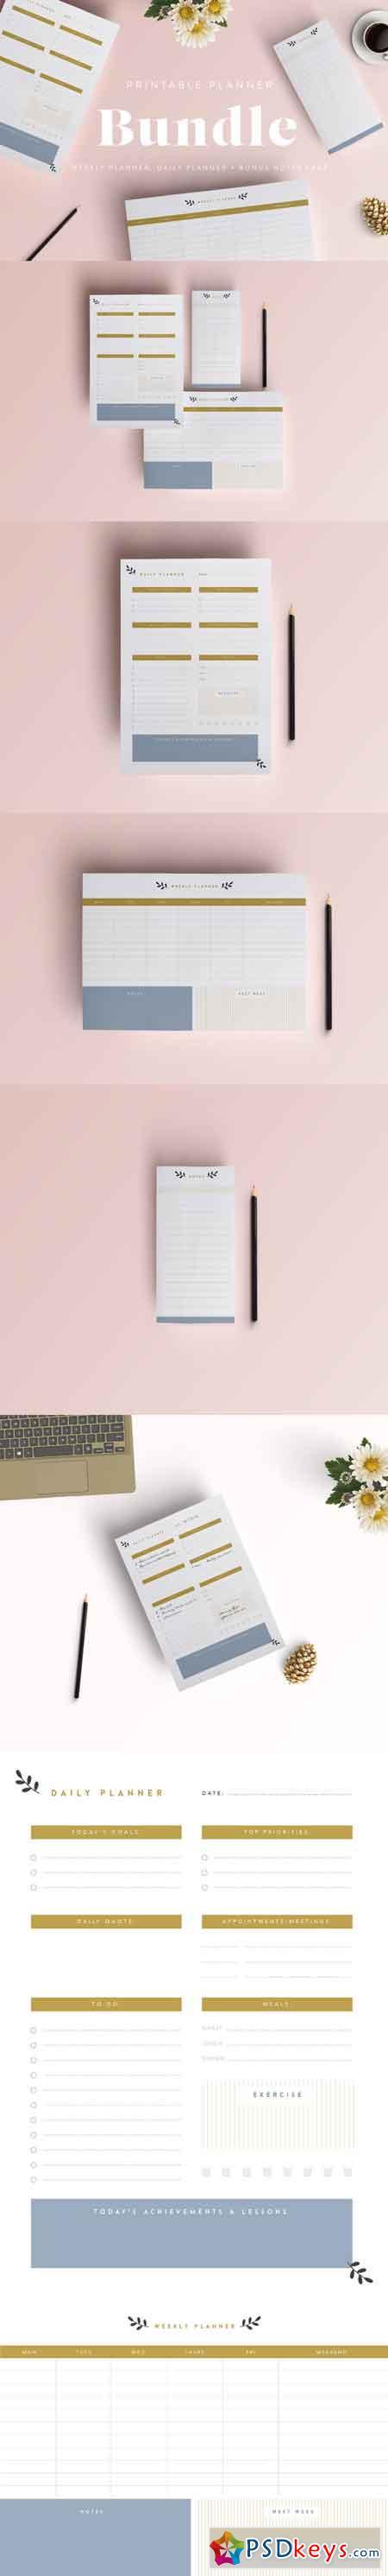 Printable Planner Bundle 678449